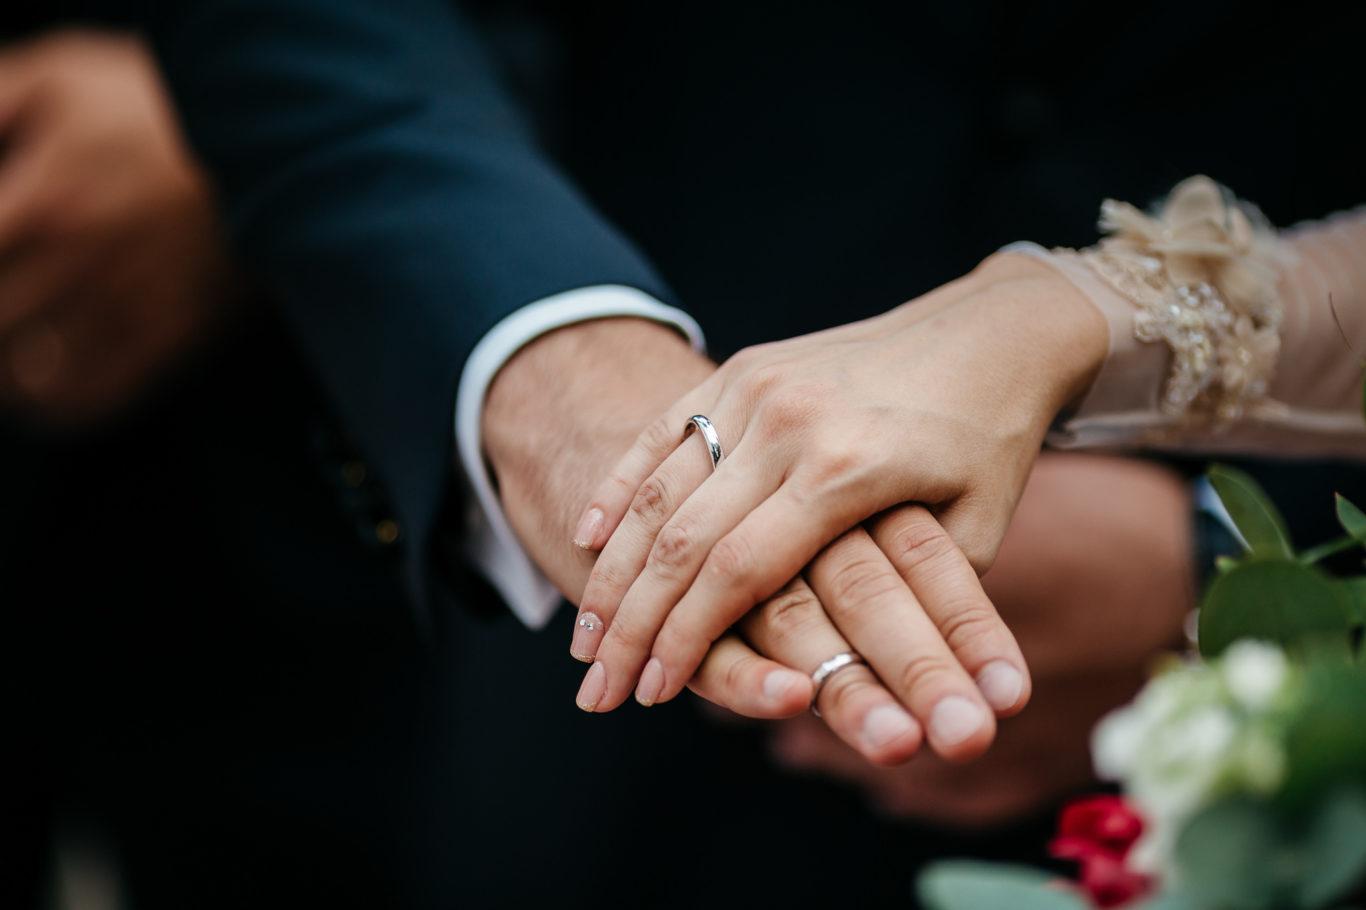 0335-Fotografie-nunta-Stirbey-Laura-Rares-fotograf-Ciprian-Dumitrescu-DCF_3762